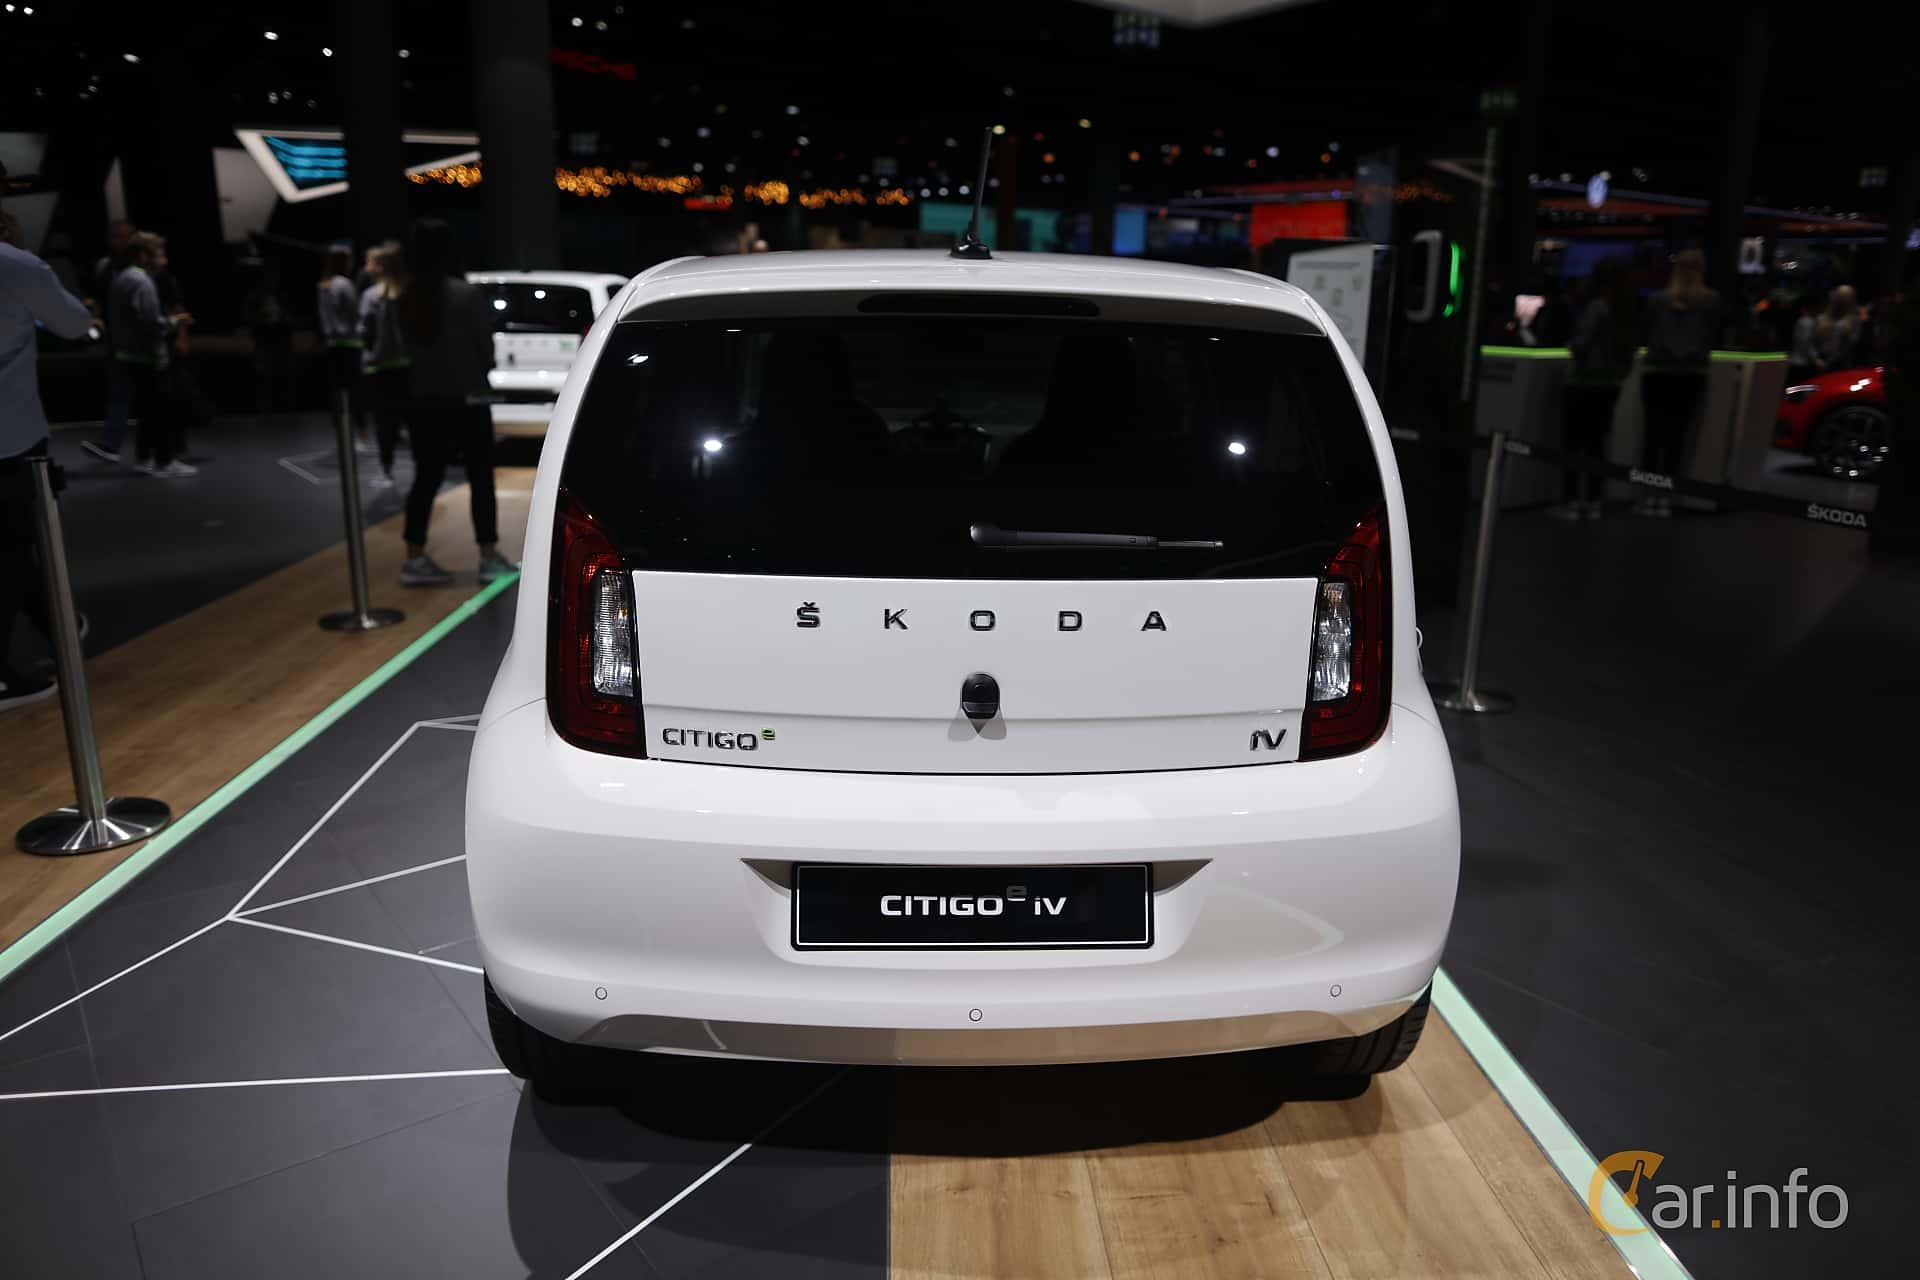 Skoda Citigo iV 36.8 kWh Single Speed, 83hp, 2020 at IAA 2019